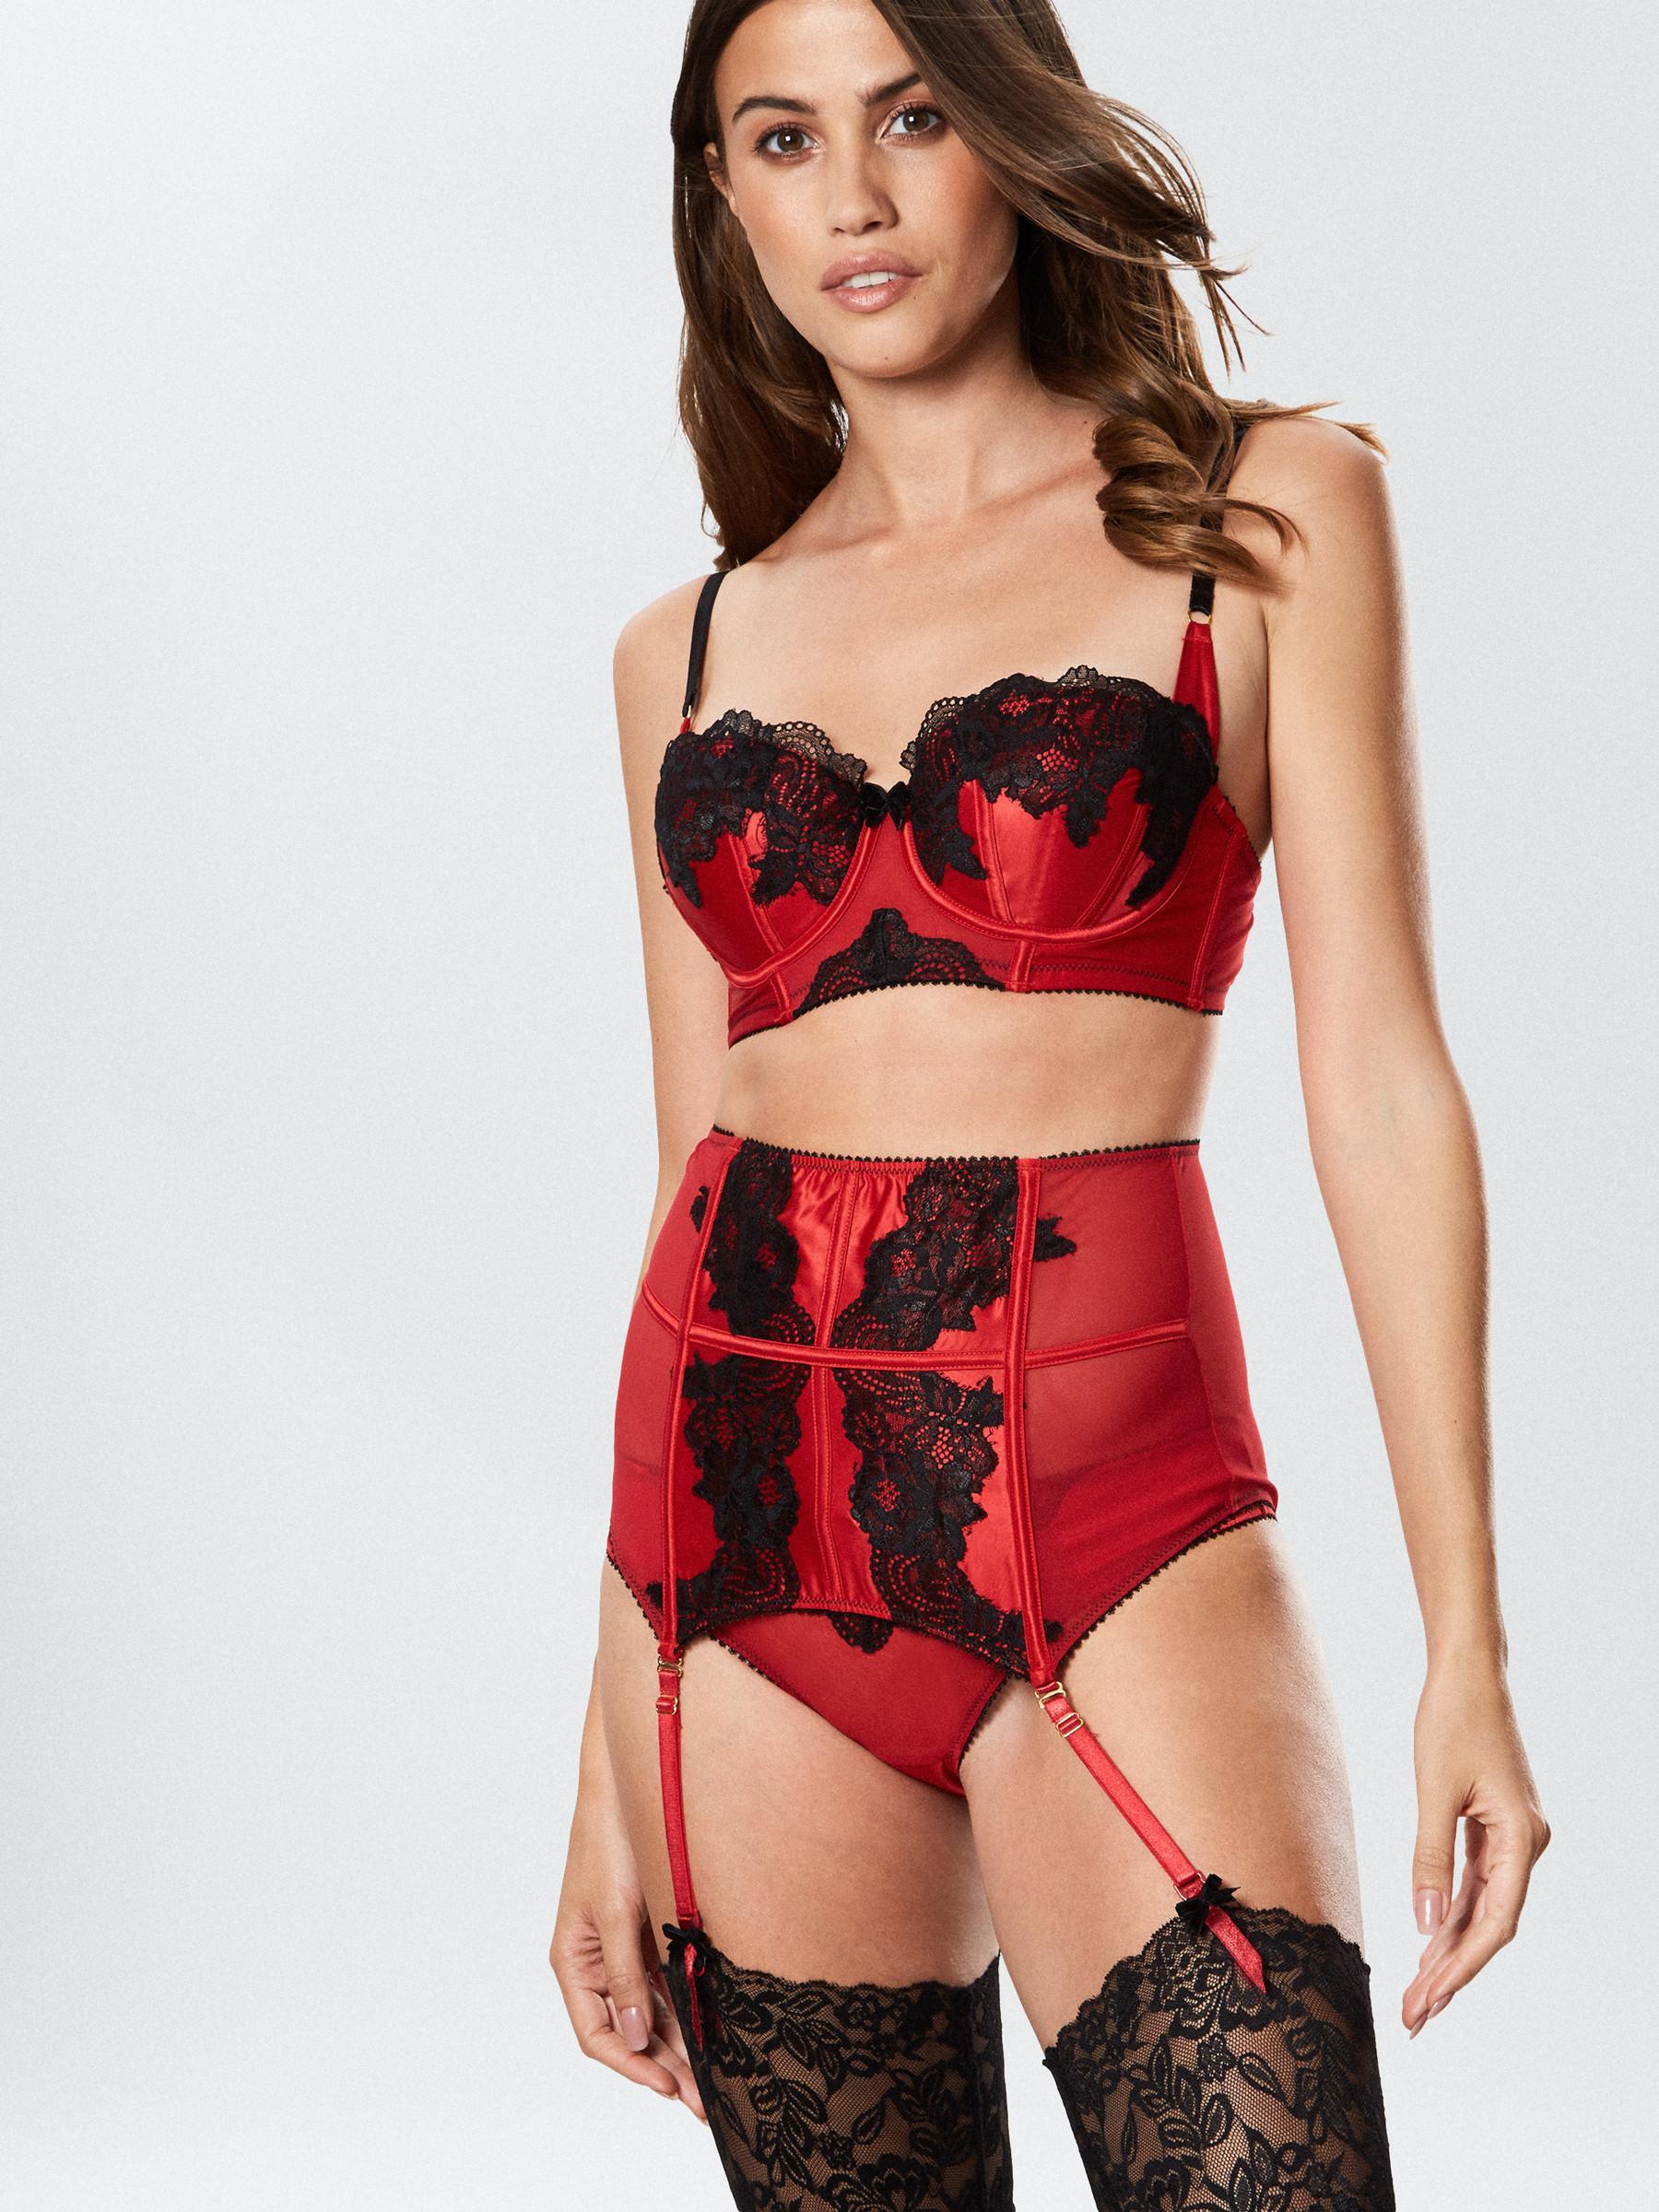 00fc12b41a20 Ann Summers Womens Alissa Waspie High Waisted Satin Sexy Lingerie Underwear